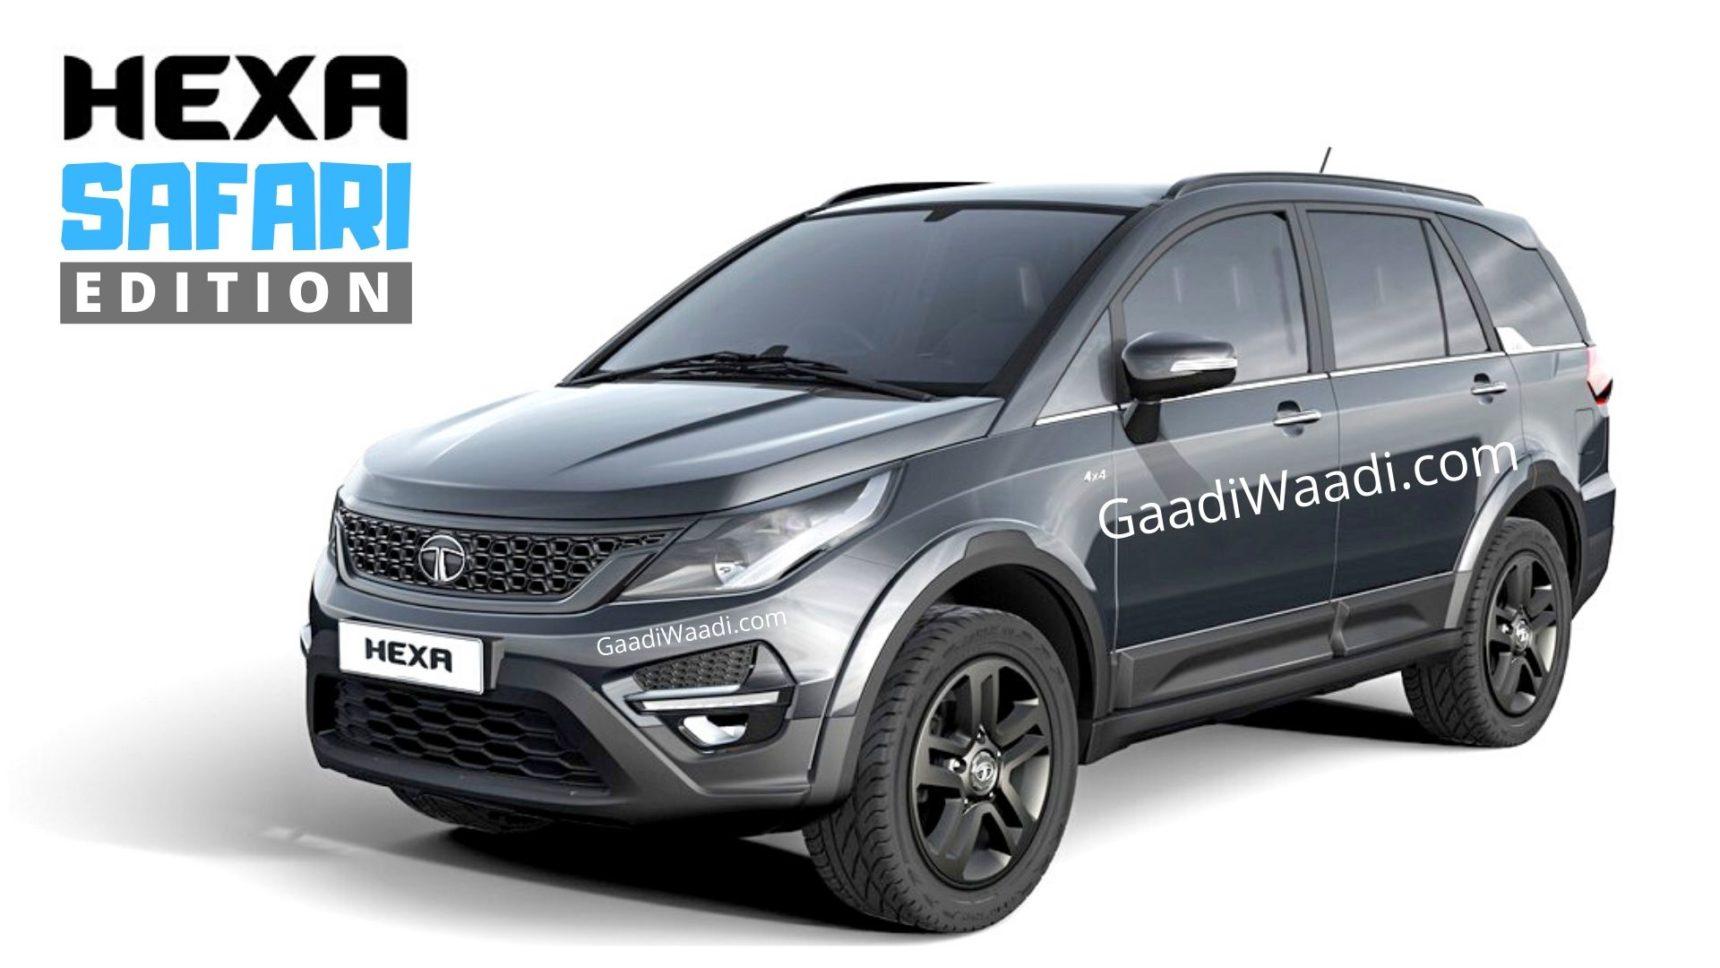 Tata Motors To Sell 4×4 Variants Of All Its Future SUVs With Safari Suffix